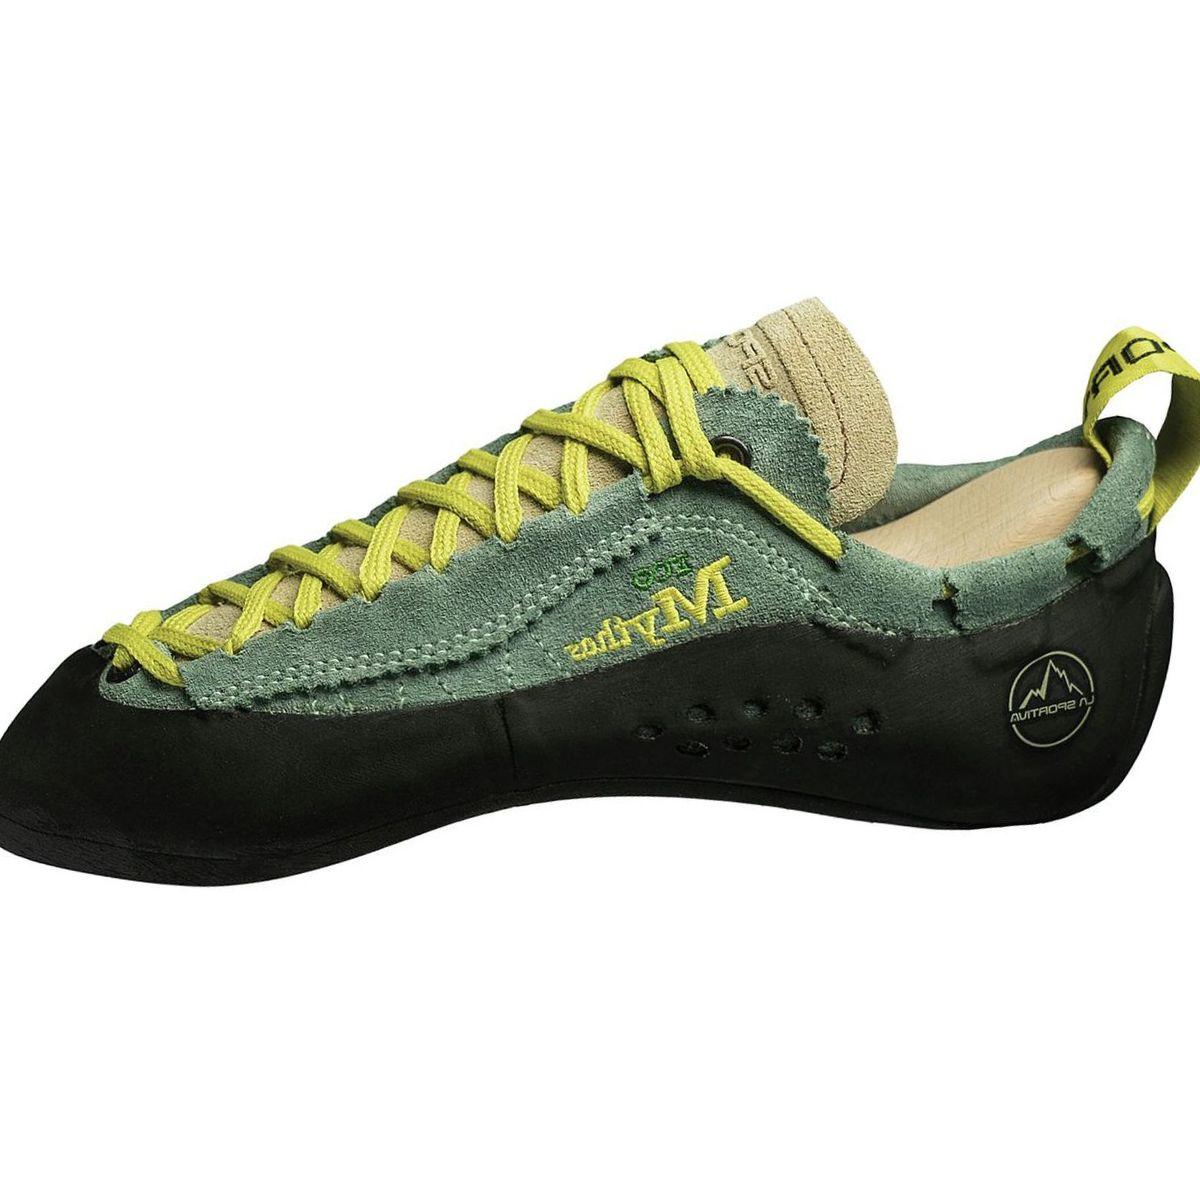 La Sportiva Mythos Eco Climbing Shoe - Women's